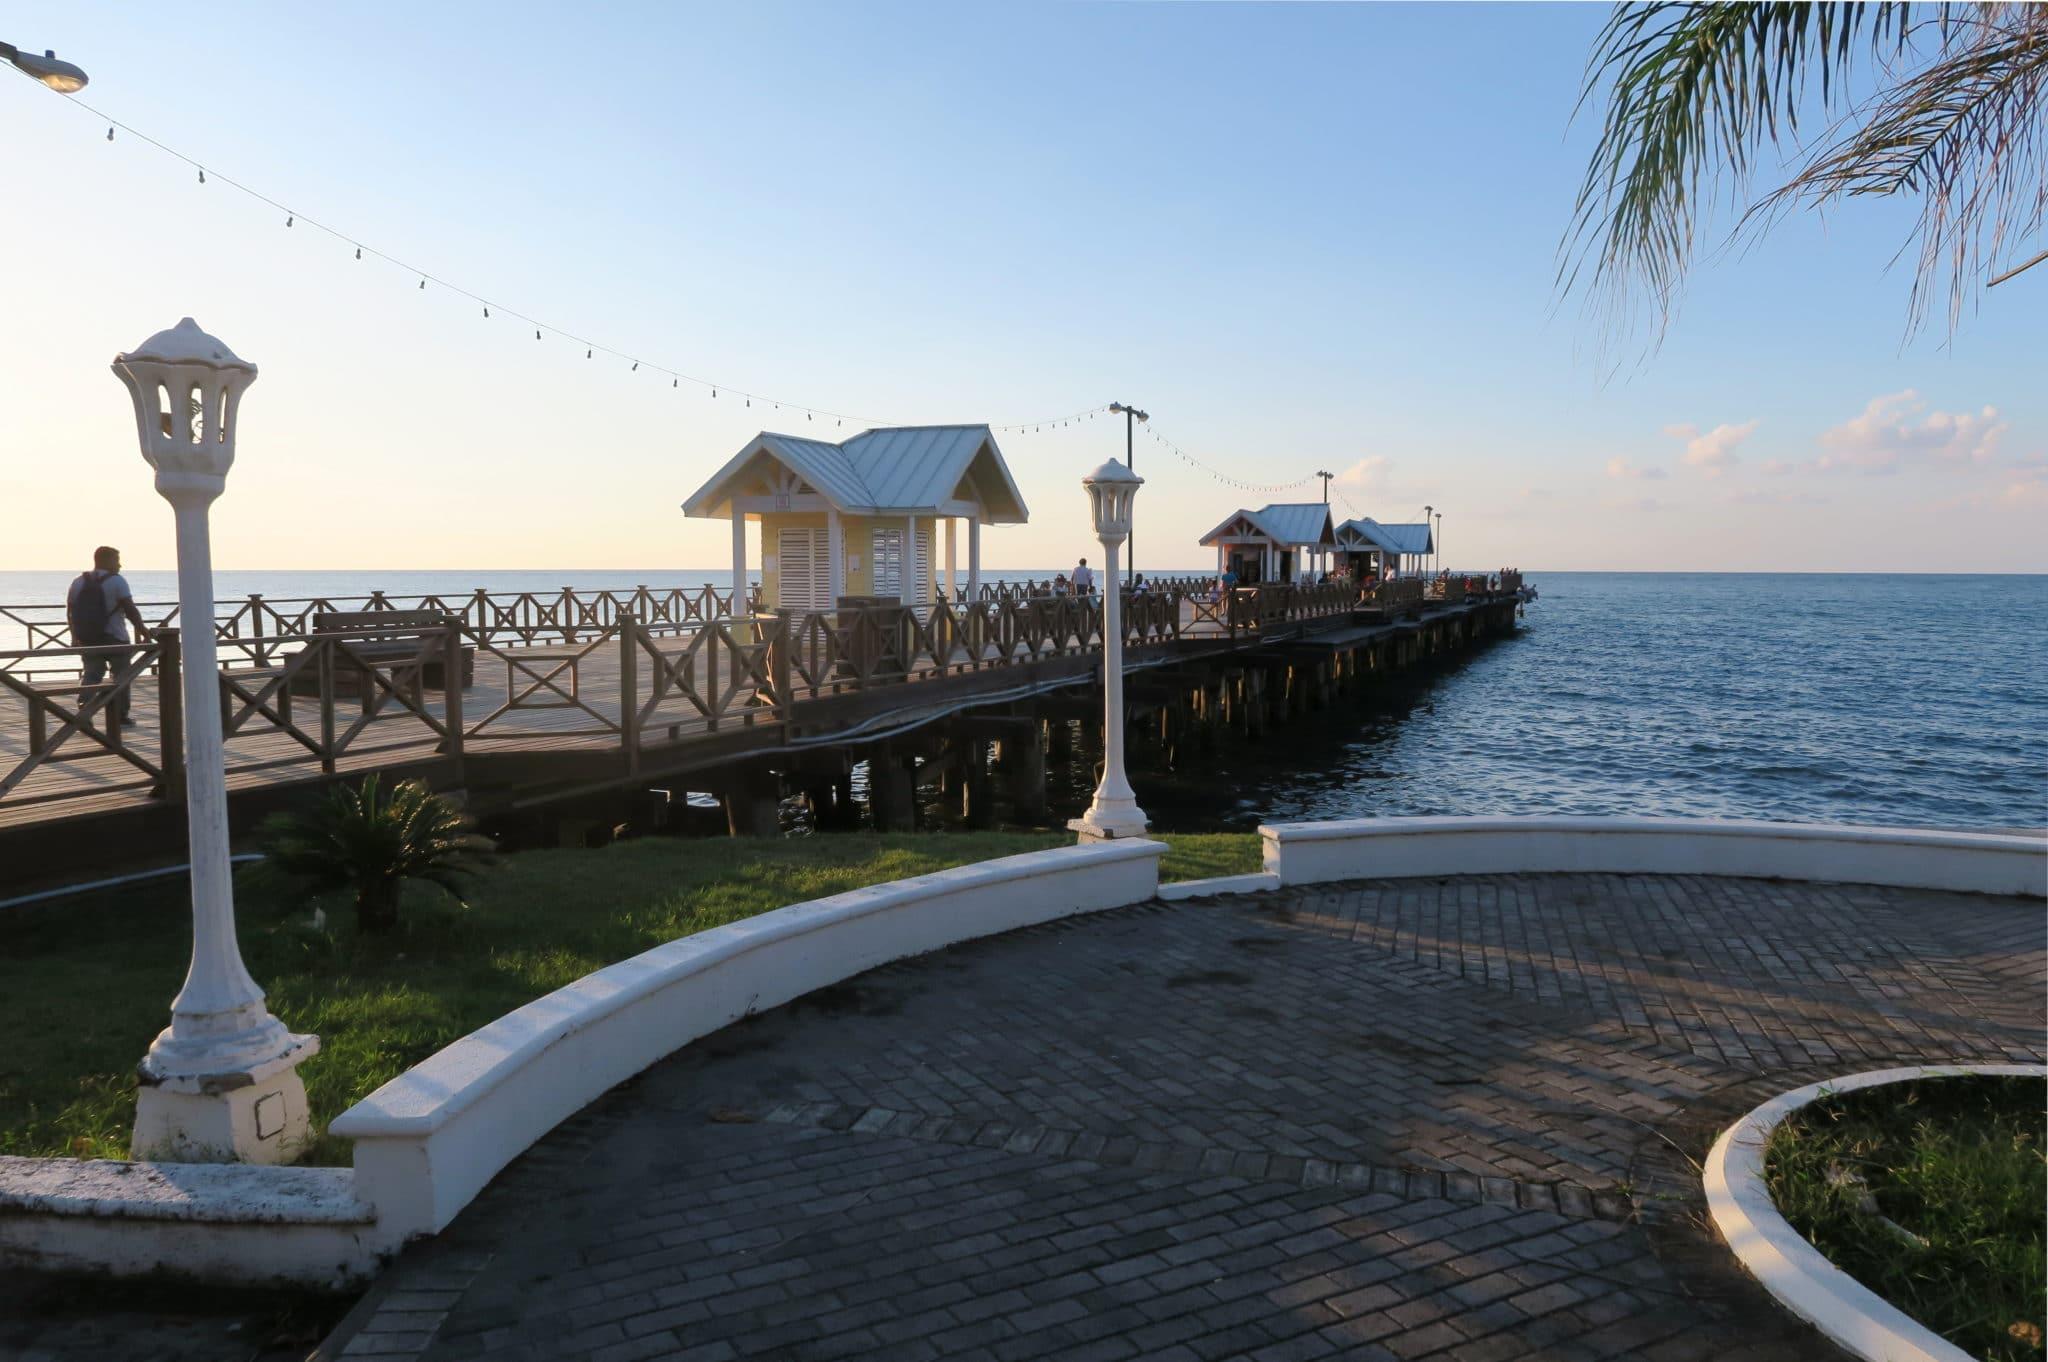 La Ceiba Muelle Fiscal Honduras